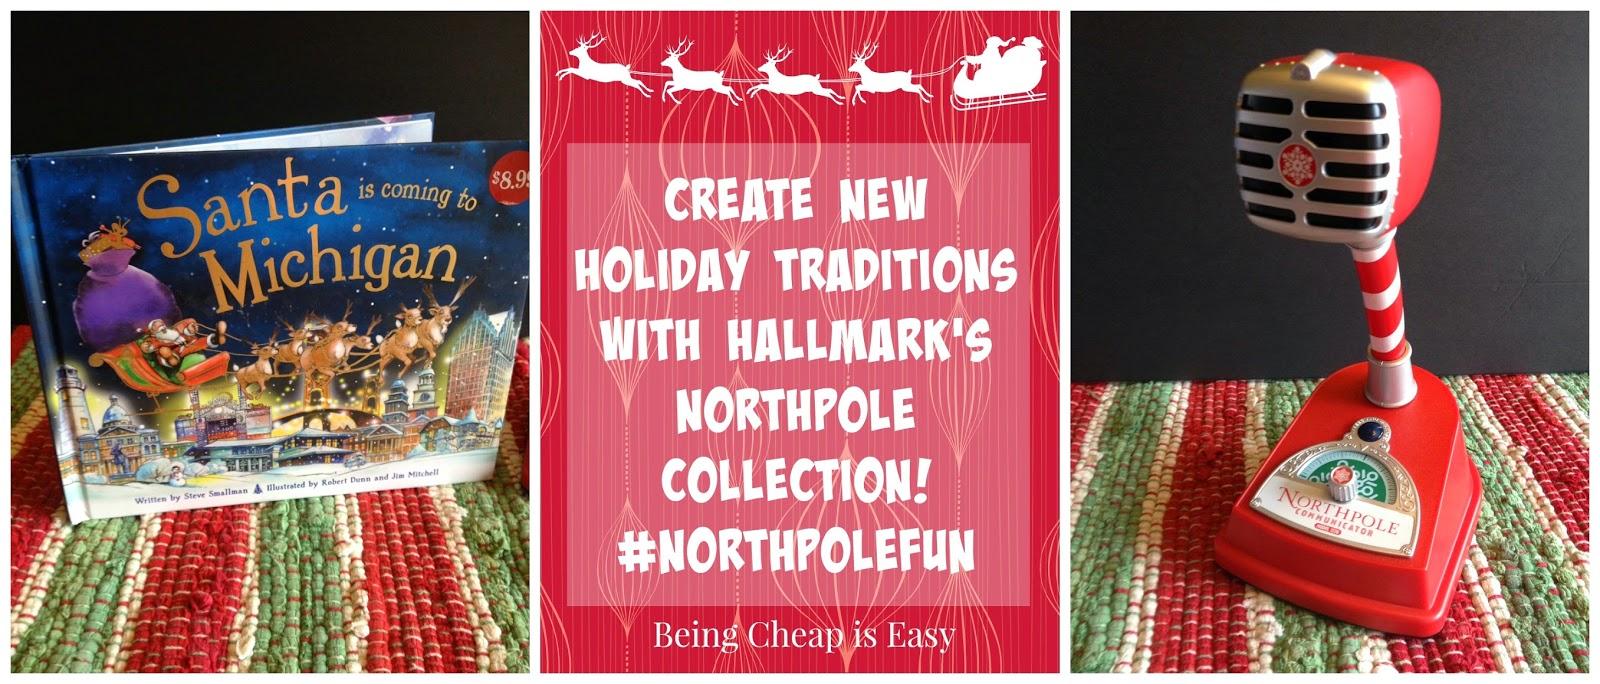 #NorthpoleFun, Hallmark, Walmart, Northpole, Santa in Michigan